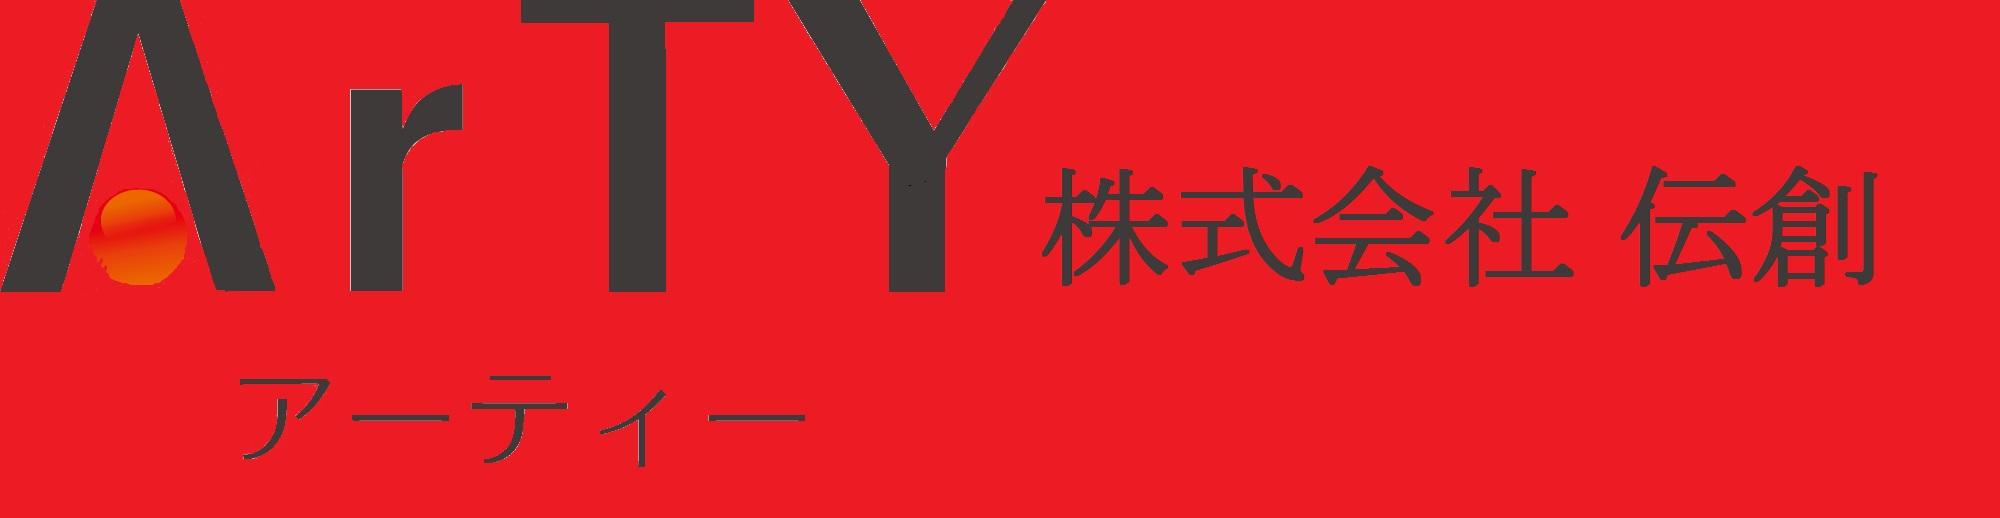 ArTY 株式会社伝創